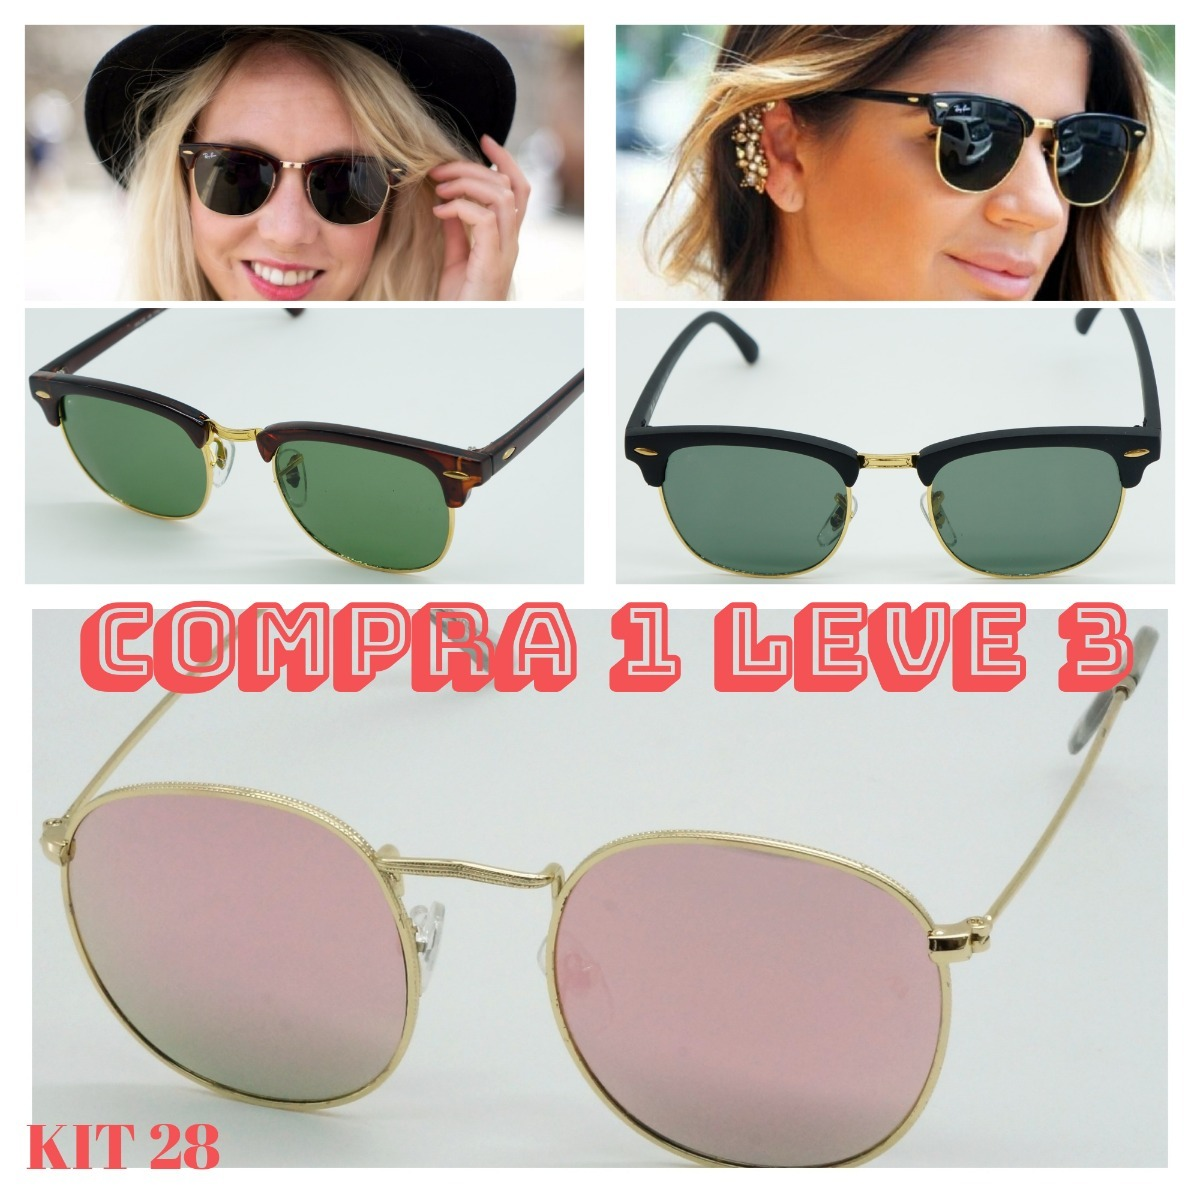 6f90ec17af6fc óculos sol club master justin feminino fosc cristal promoçao. 10 Fotos